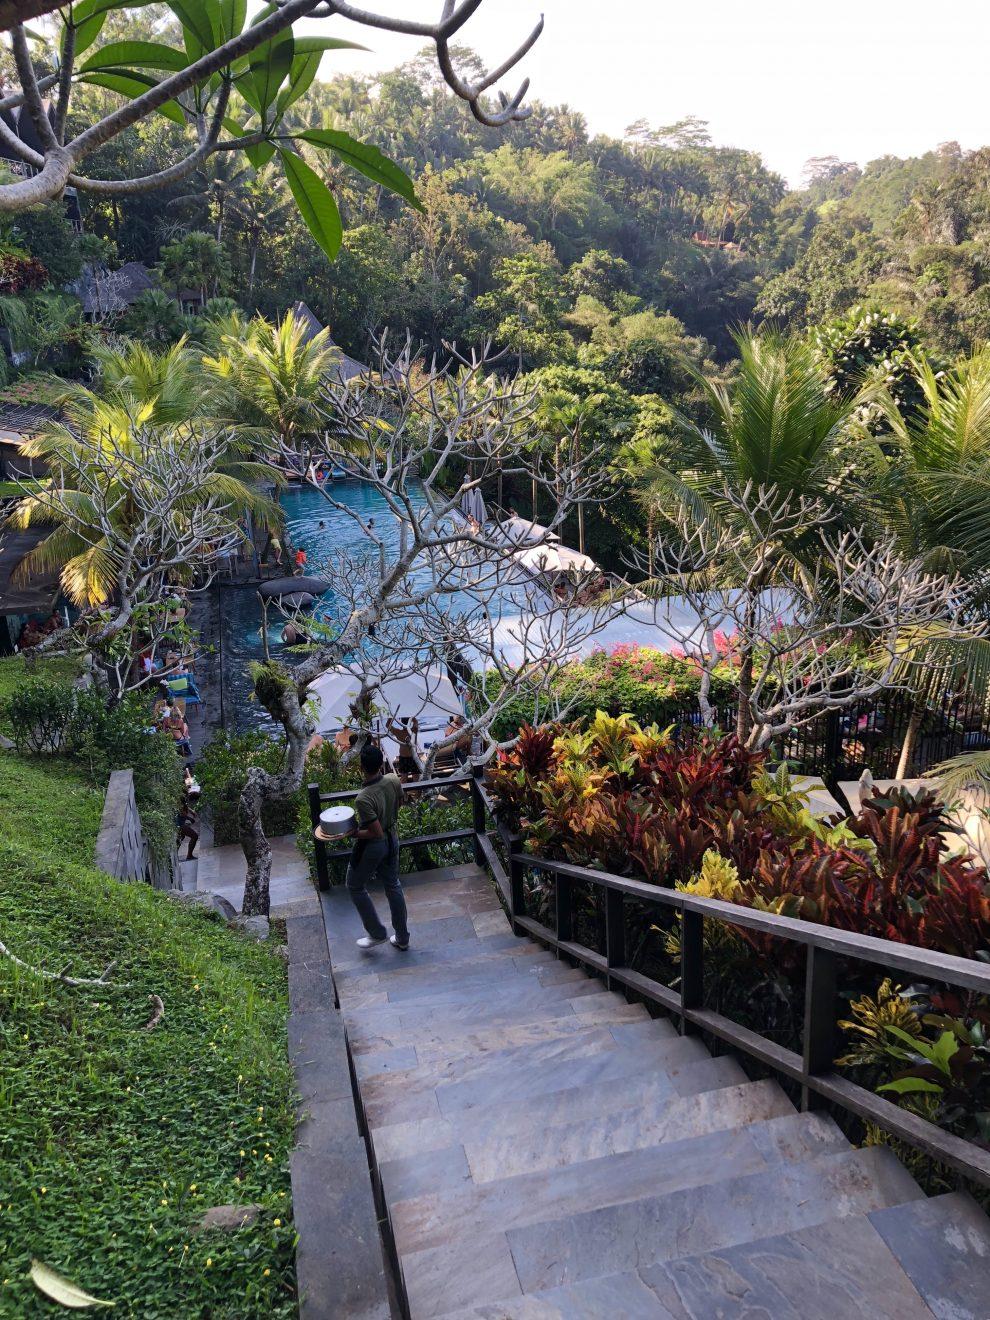 Eerste keer op vakantie naar Bali. 21-daagse reisroute & 10 tips - dingen doen in Ubud - beachclub Jungle Fish